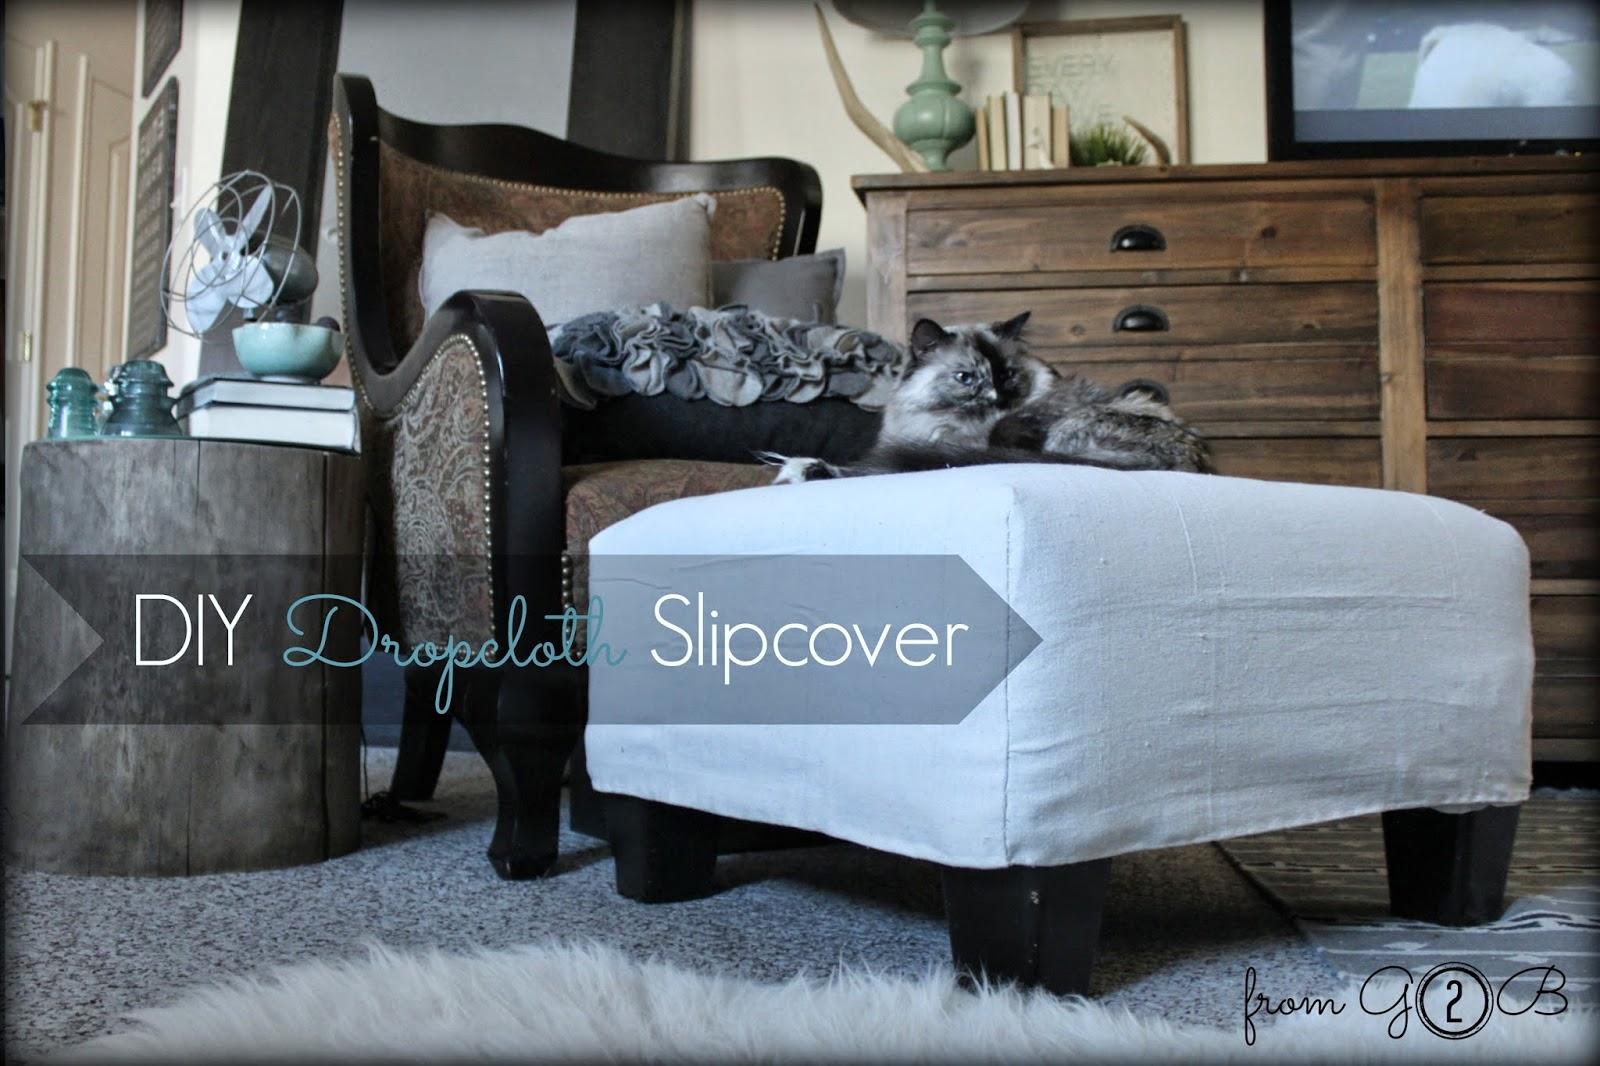 From Gardners 2 Bergers Diy Dropcloth Slipcover